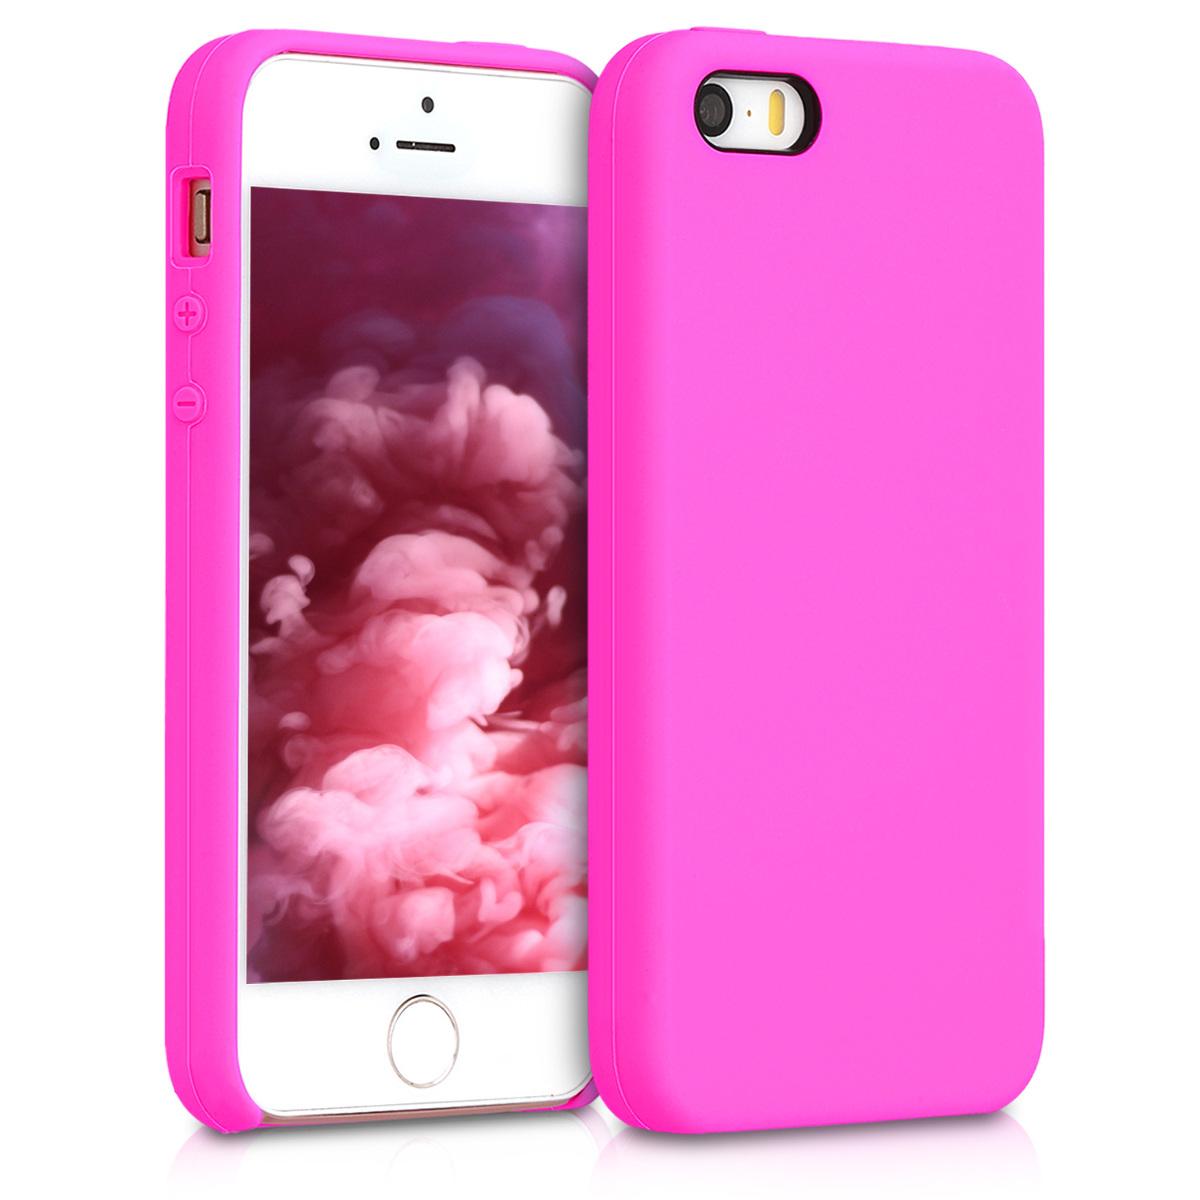 KW TPU Θήκη Σιλικόνης - Apple iPhone SE / 5 / 5S - Magenta (42766.135)